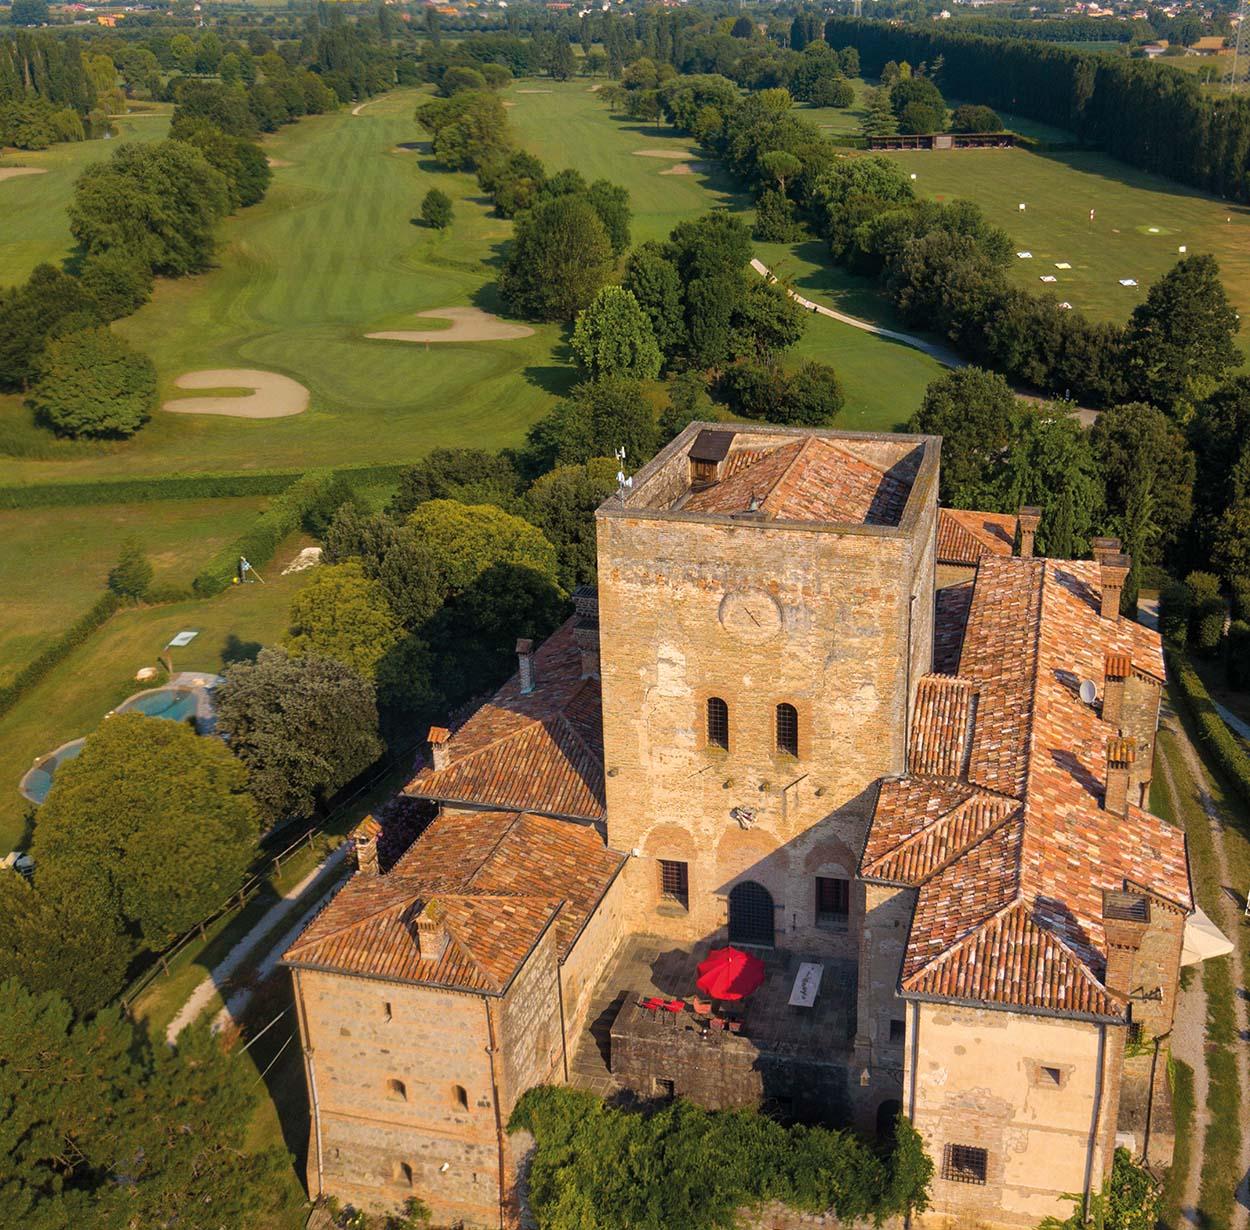 Montecchia_Golf_Club_04_DJI_0155-r